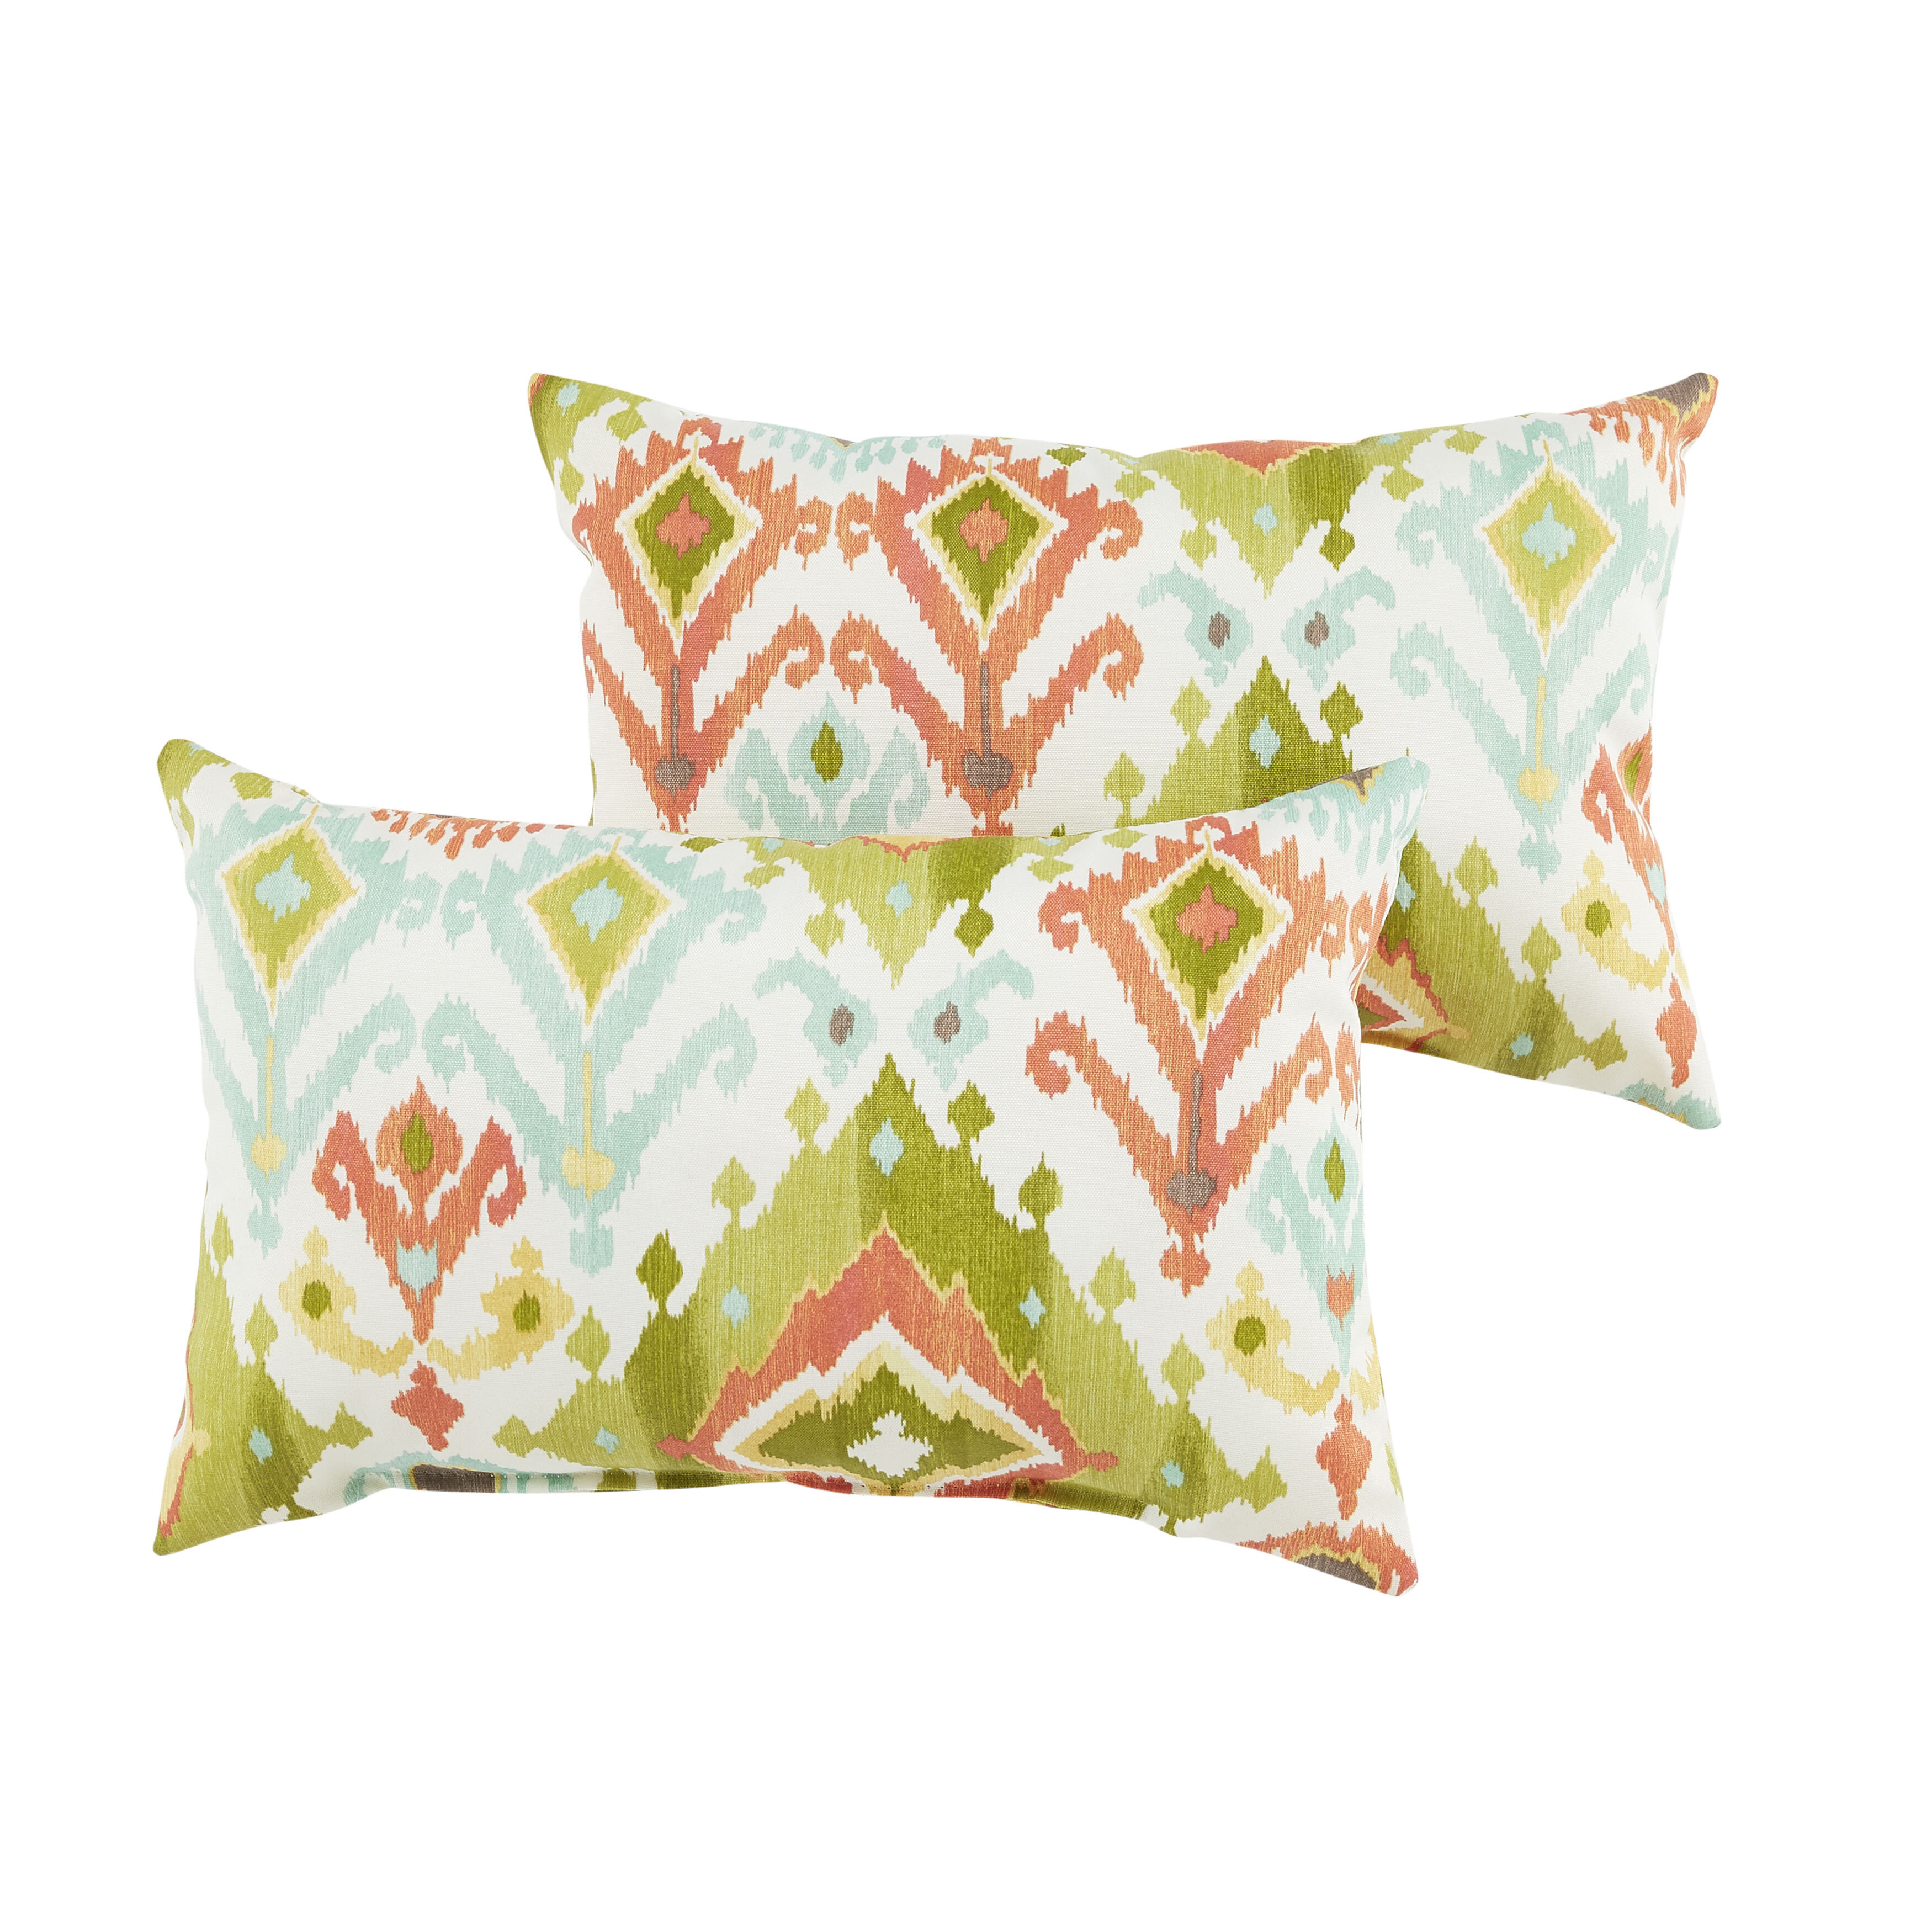 coast pillow in lumbar orange x com classic walmart coral of rectangle ip set outdoor